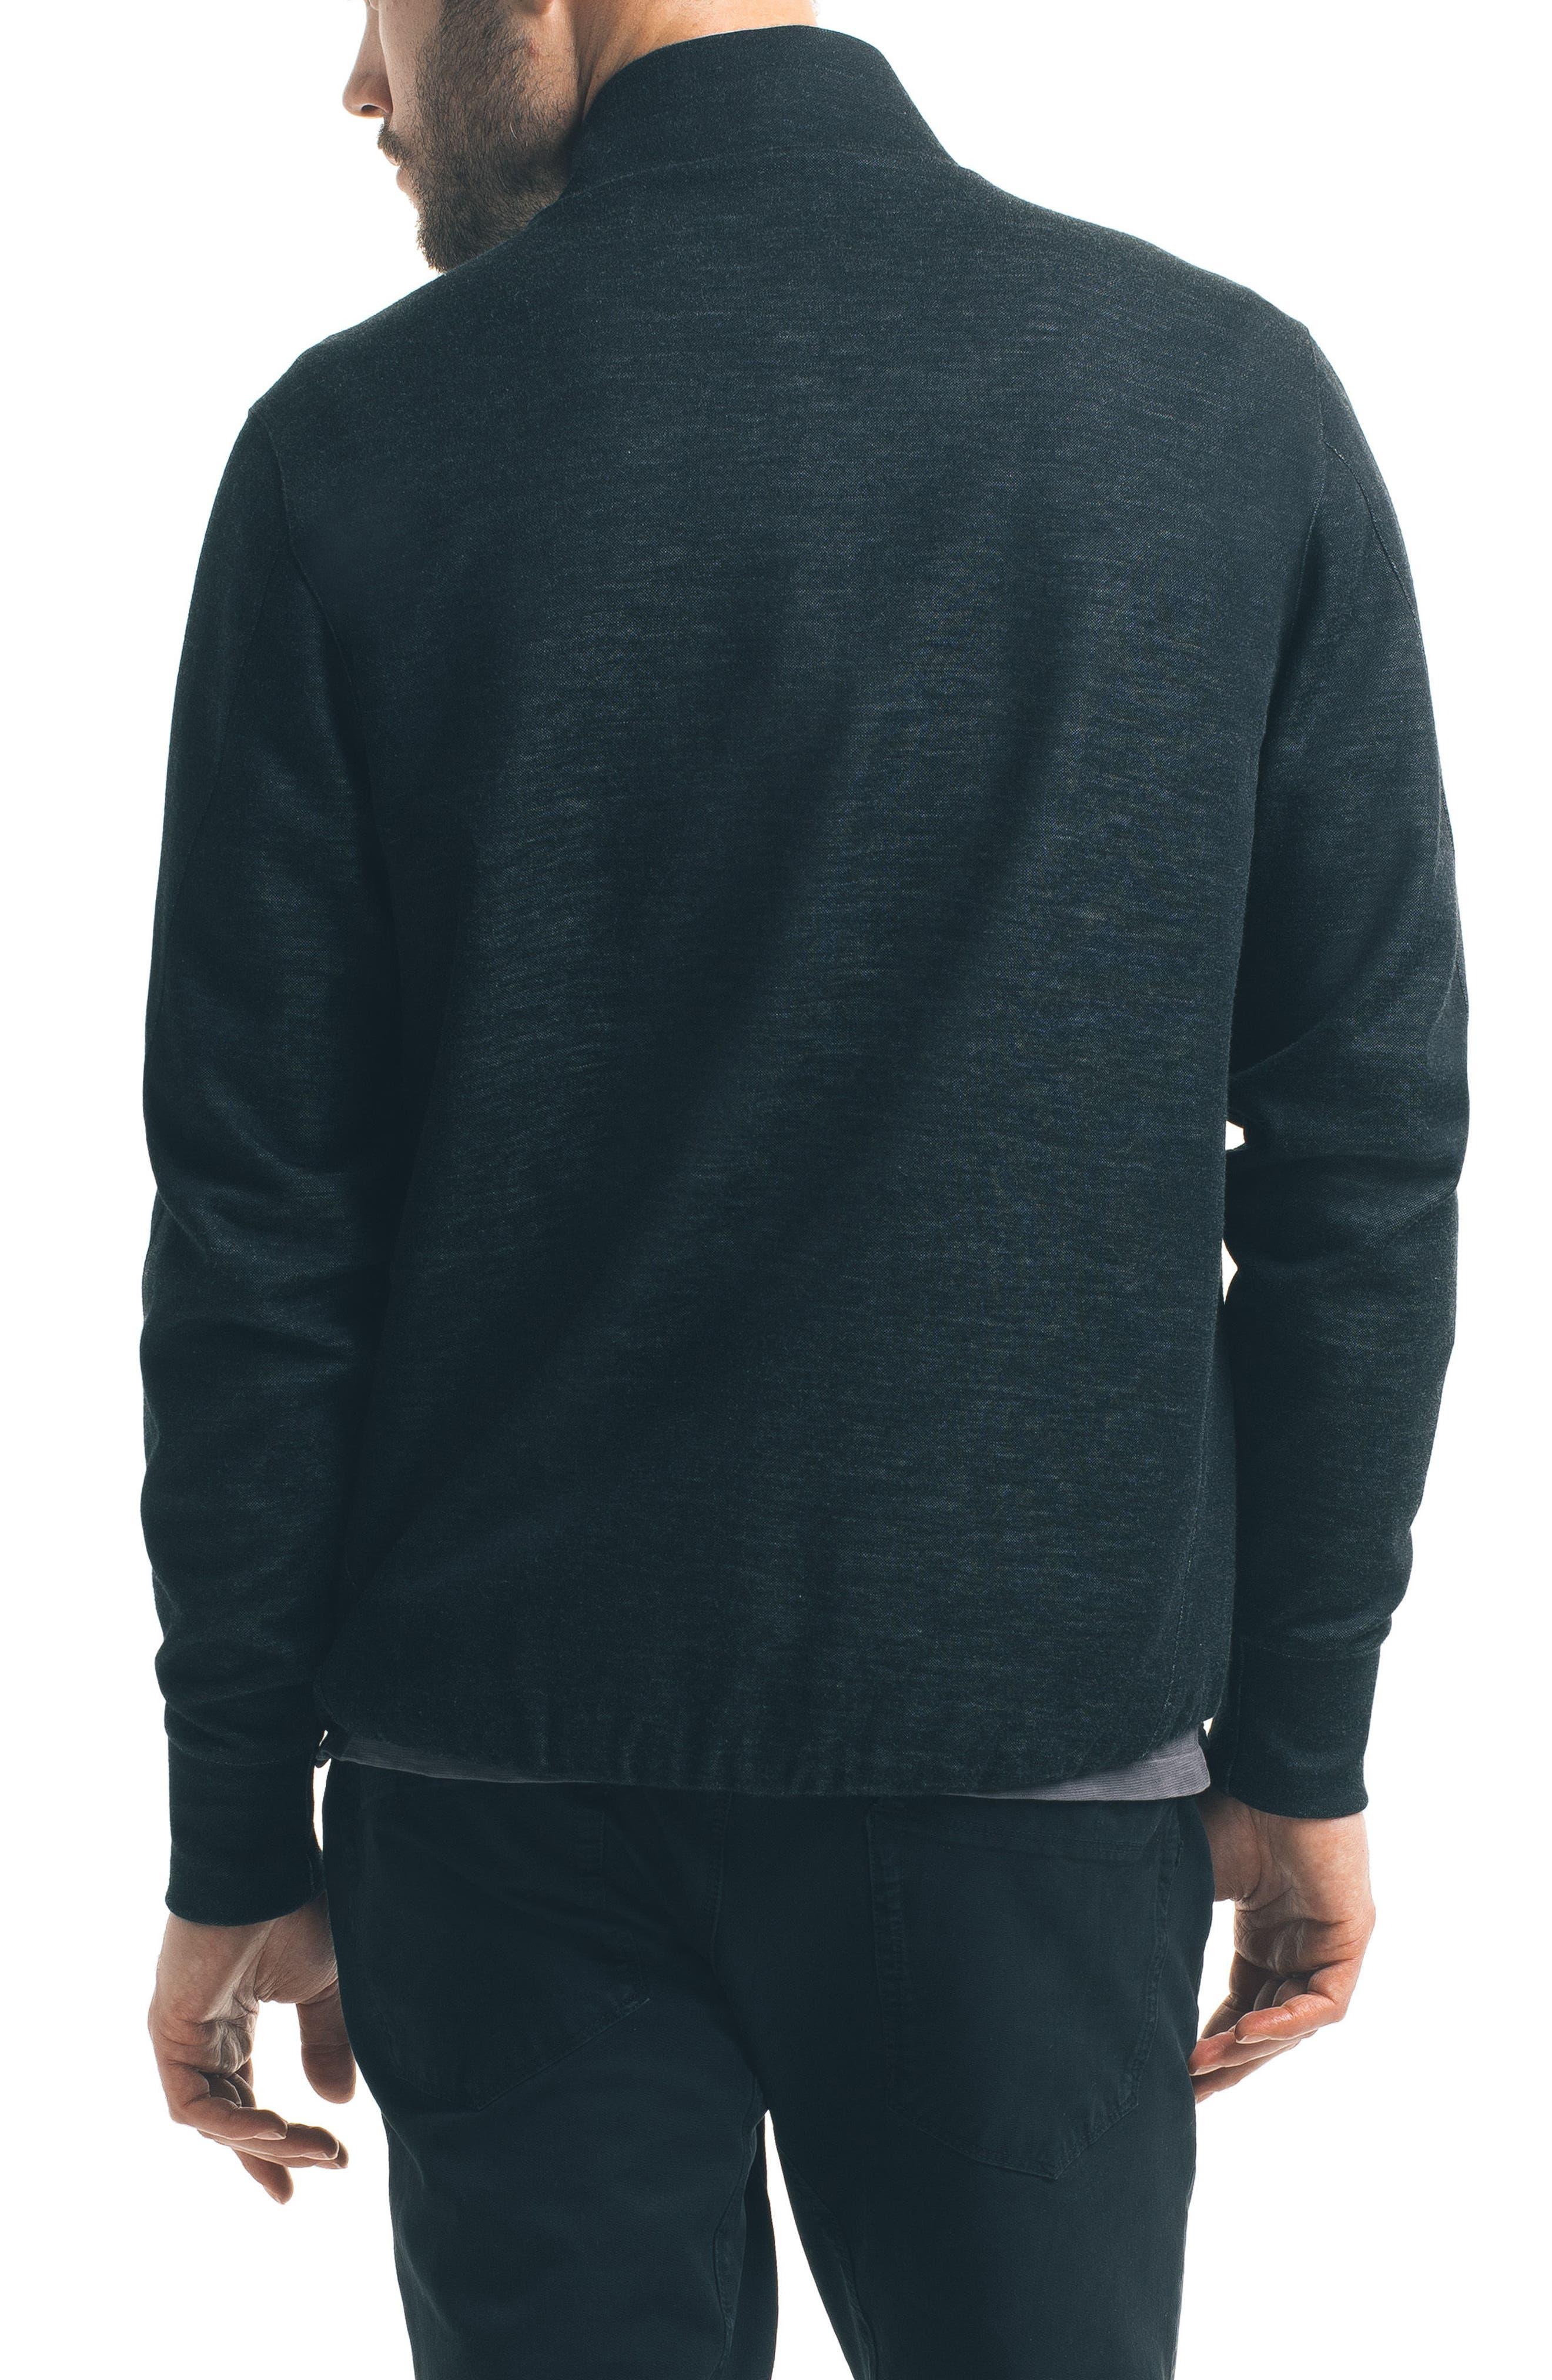 Modern Slim Fit Bomber Jacket,                             Alternate thumbnail 2, color,                             Black